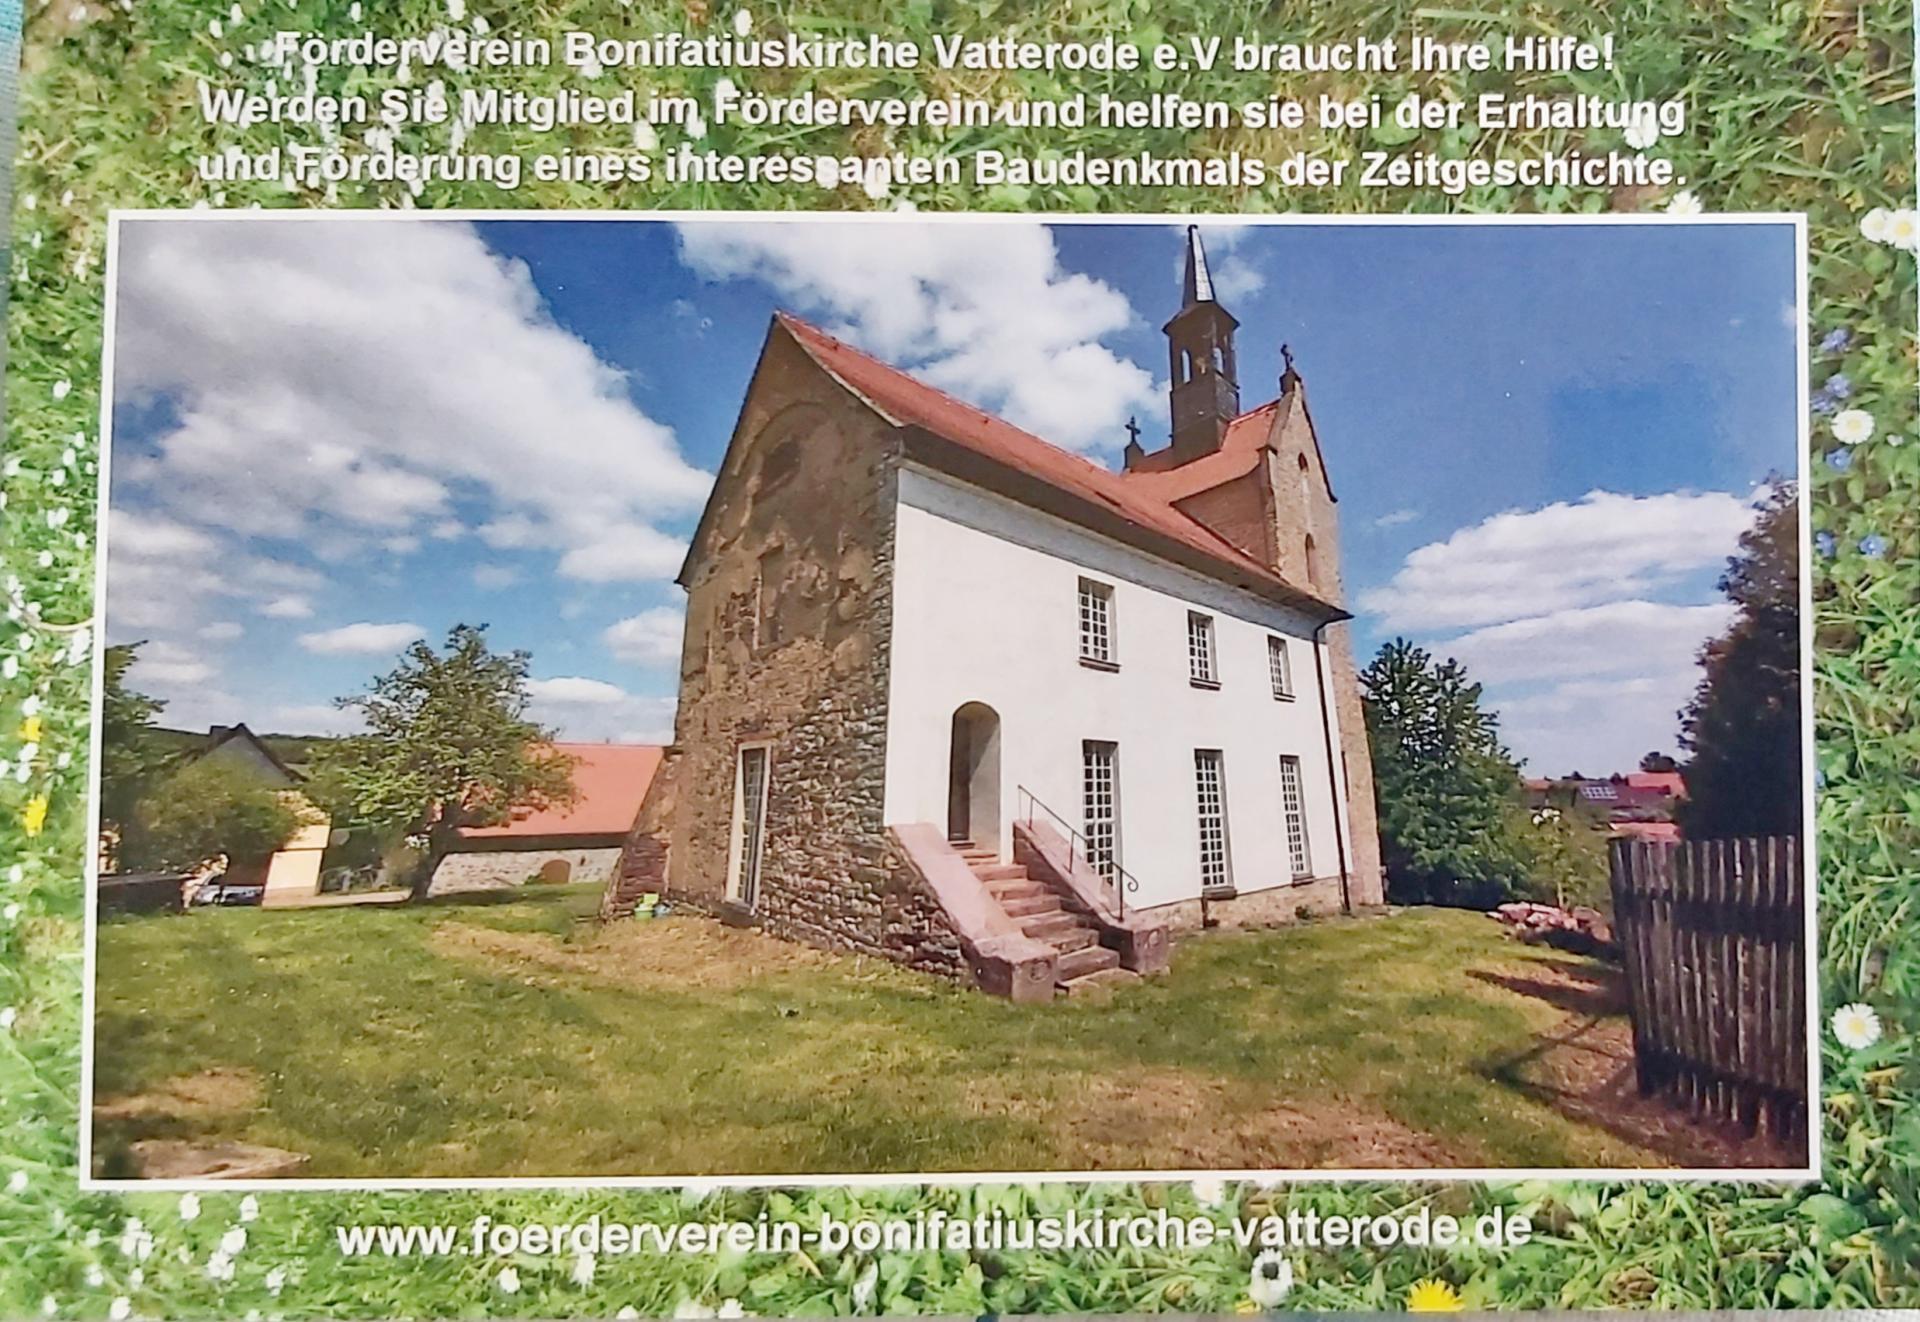 Spenden-Postkarte Bonifatiuskirche Vatterode